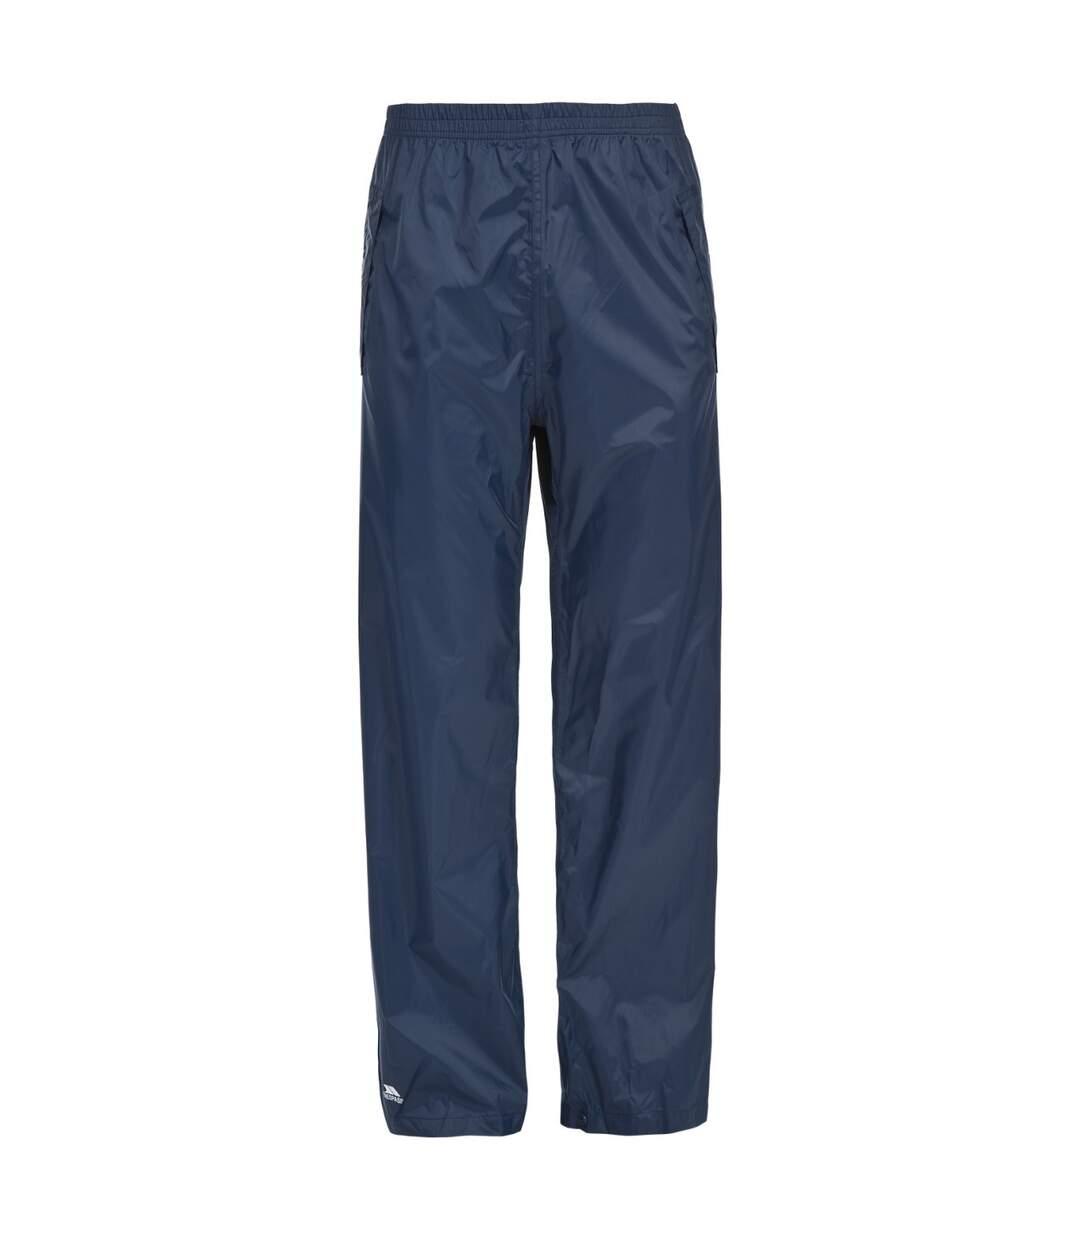 Trespass Adults Unisex Packup Trouser Waterproof Packaway Trousers (Navy) - UTTP1335